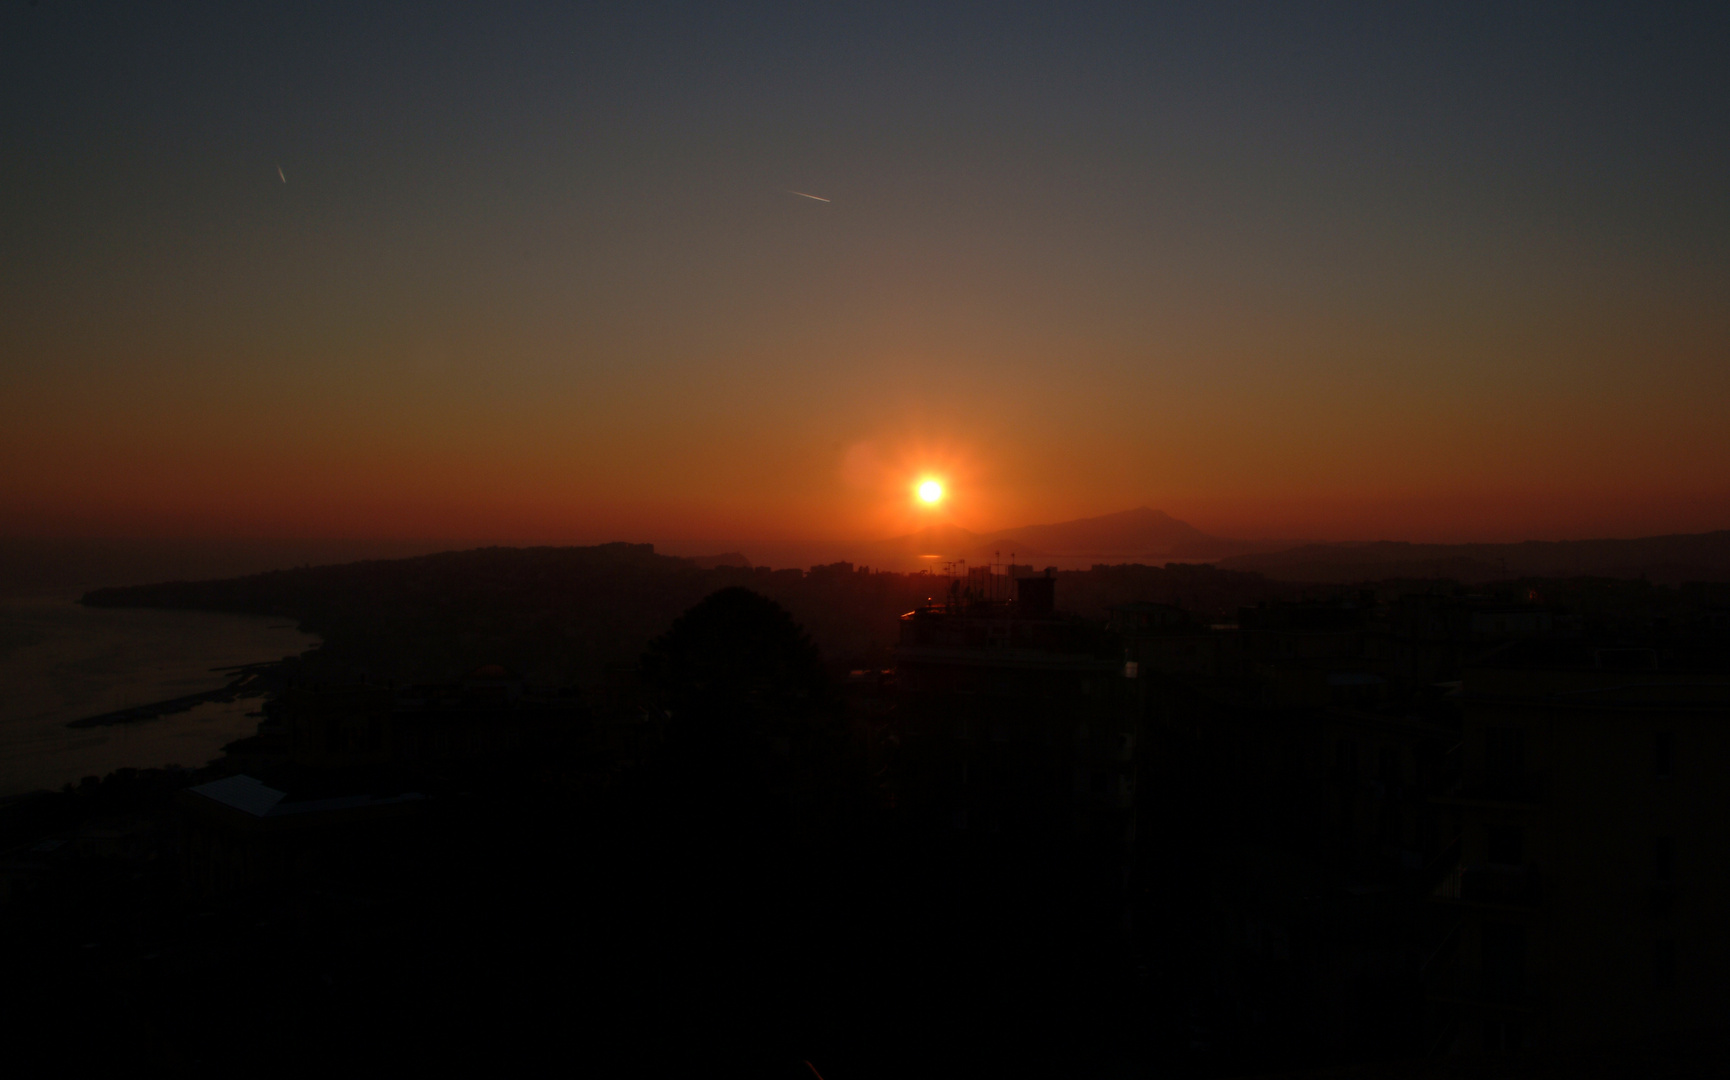 Sunset in Napoli - View towards Pozzuoli and Ischia